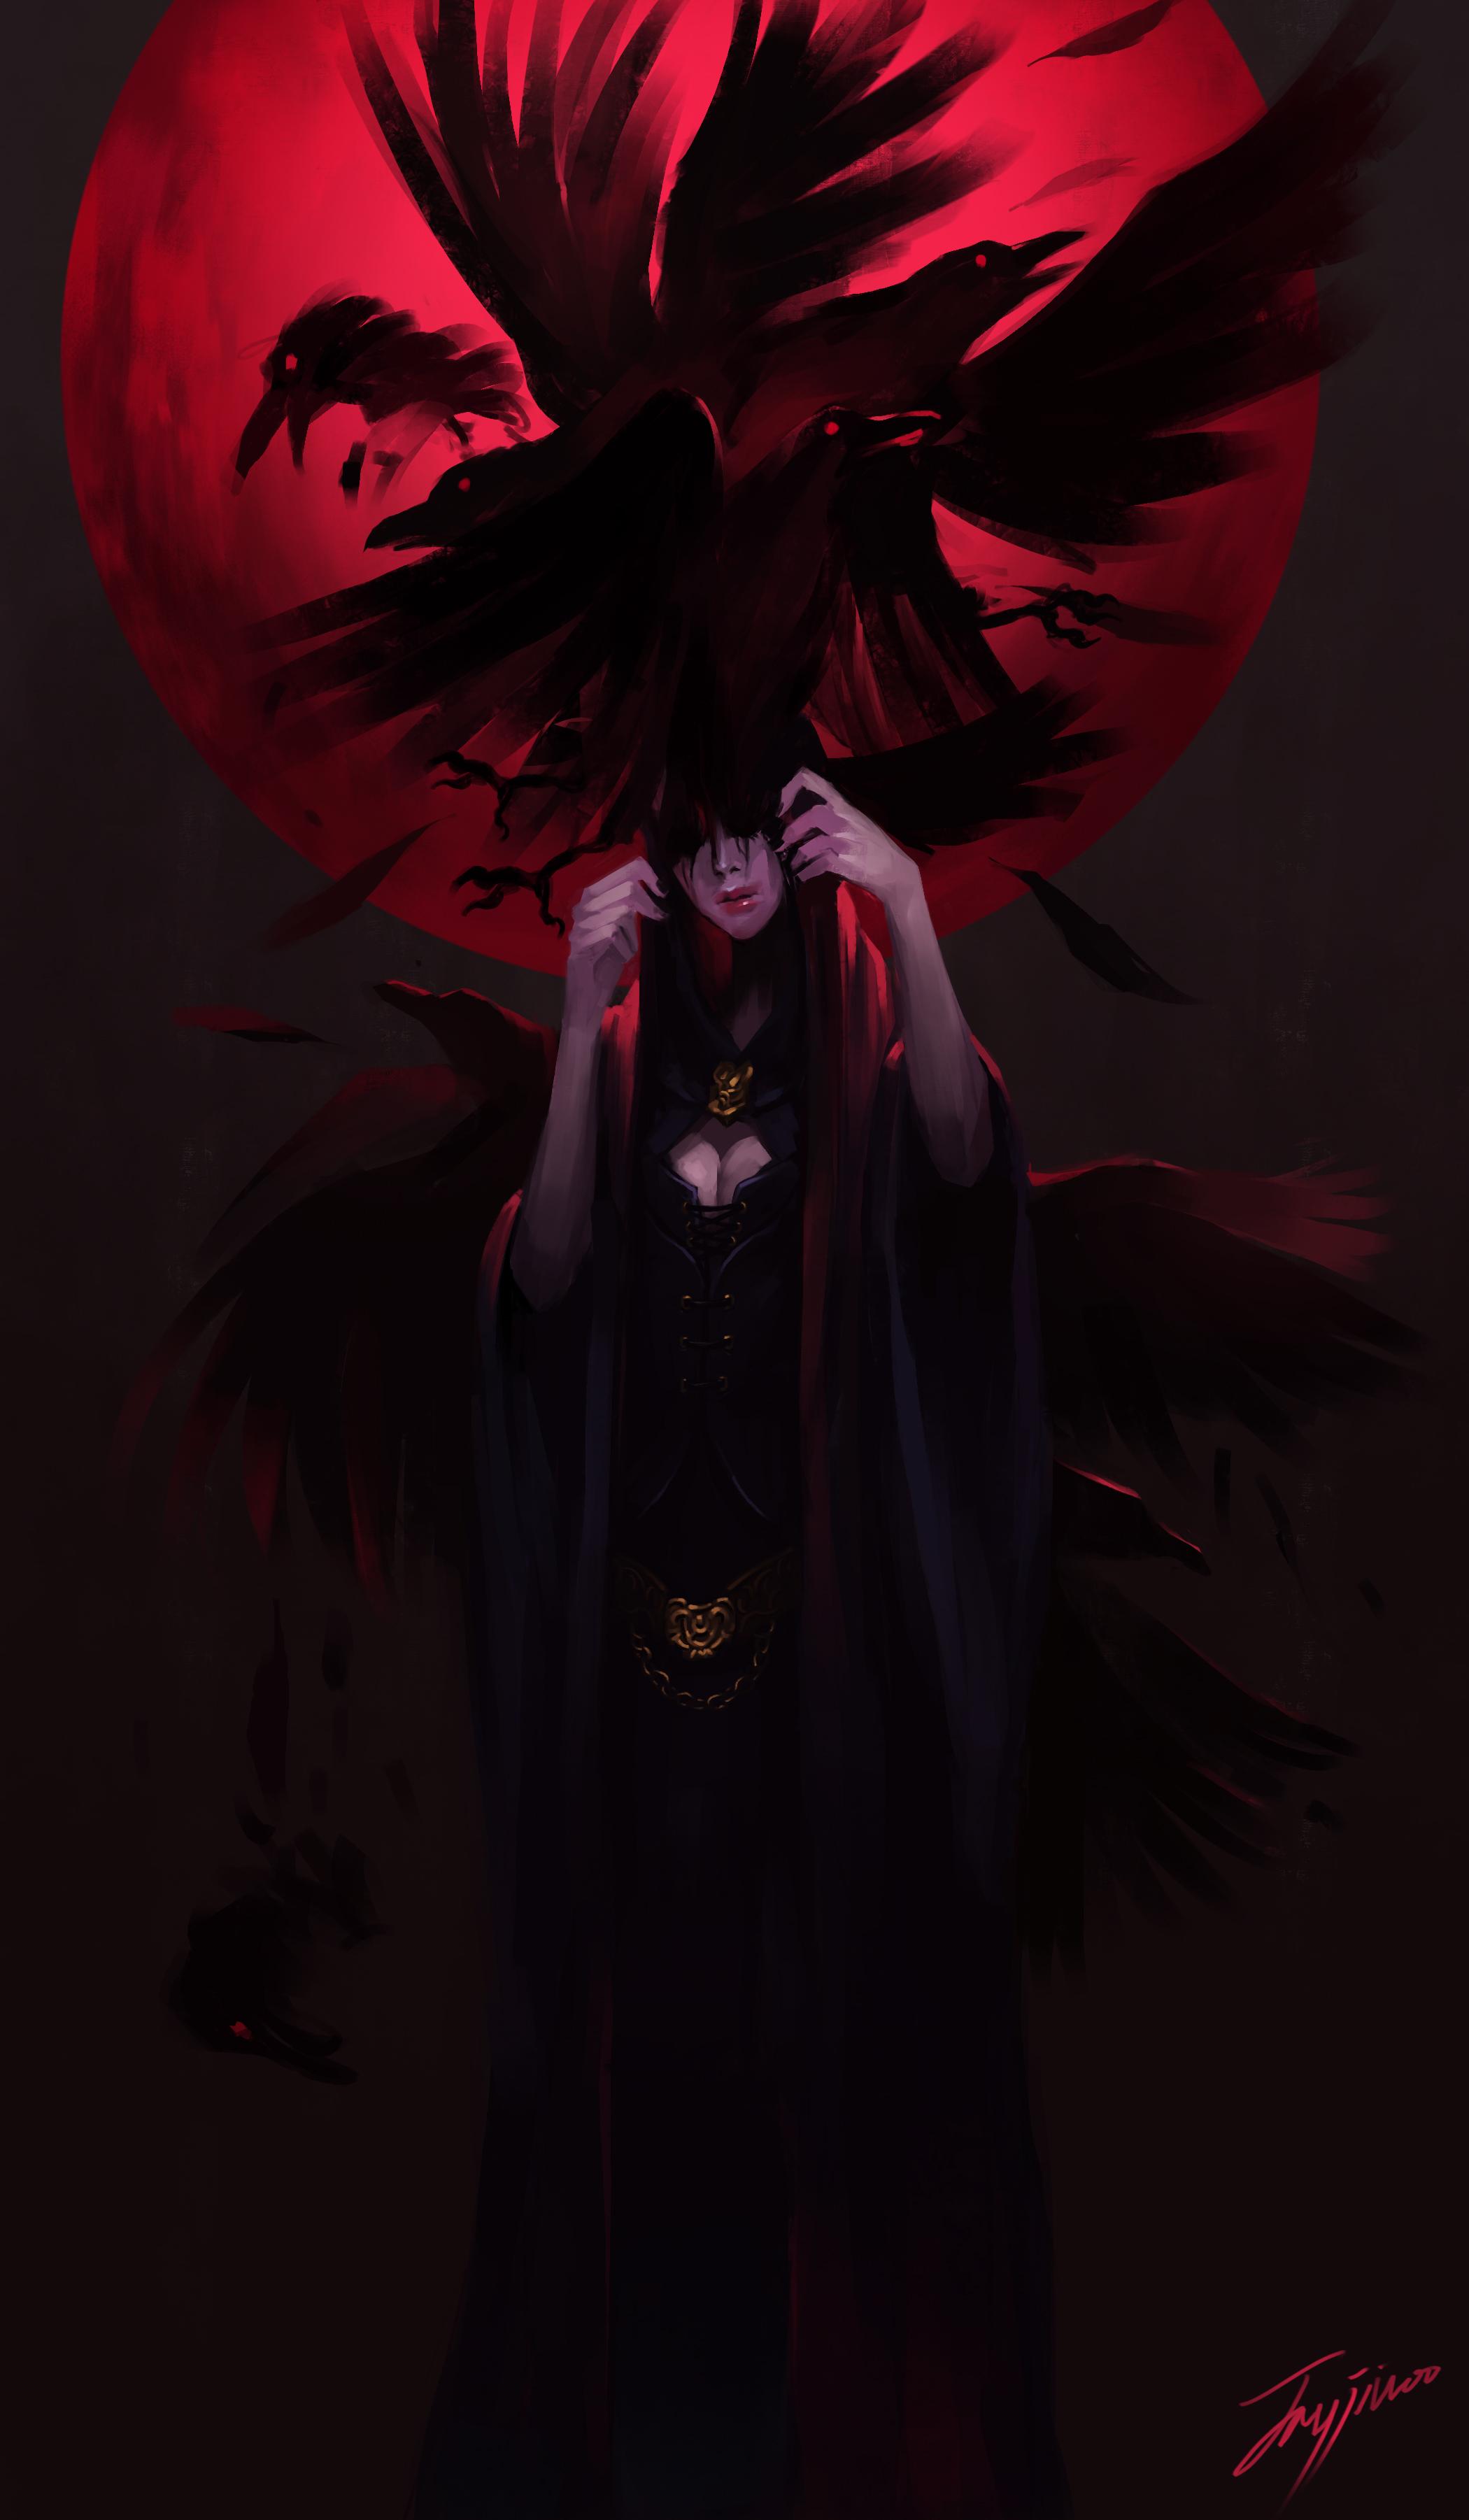 Digital Art Illustration Midfinger Original Characters Crow Red Moon Moon Vertical 2100x3603